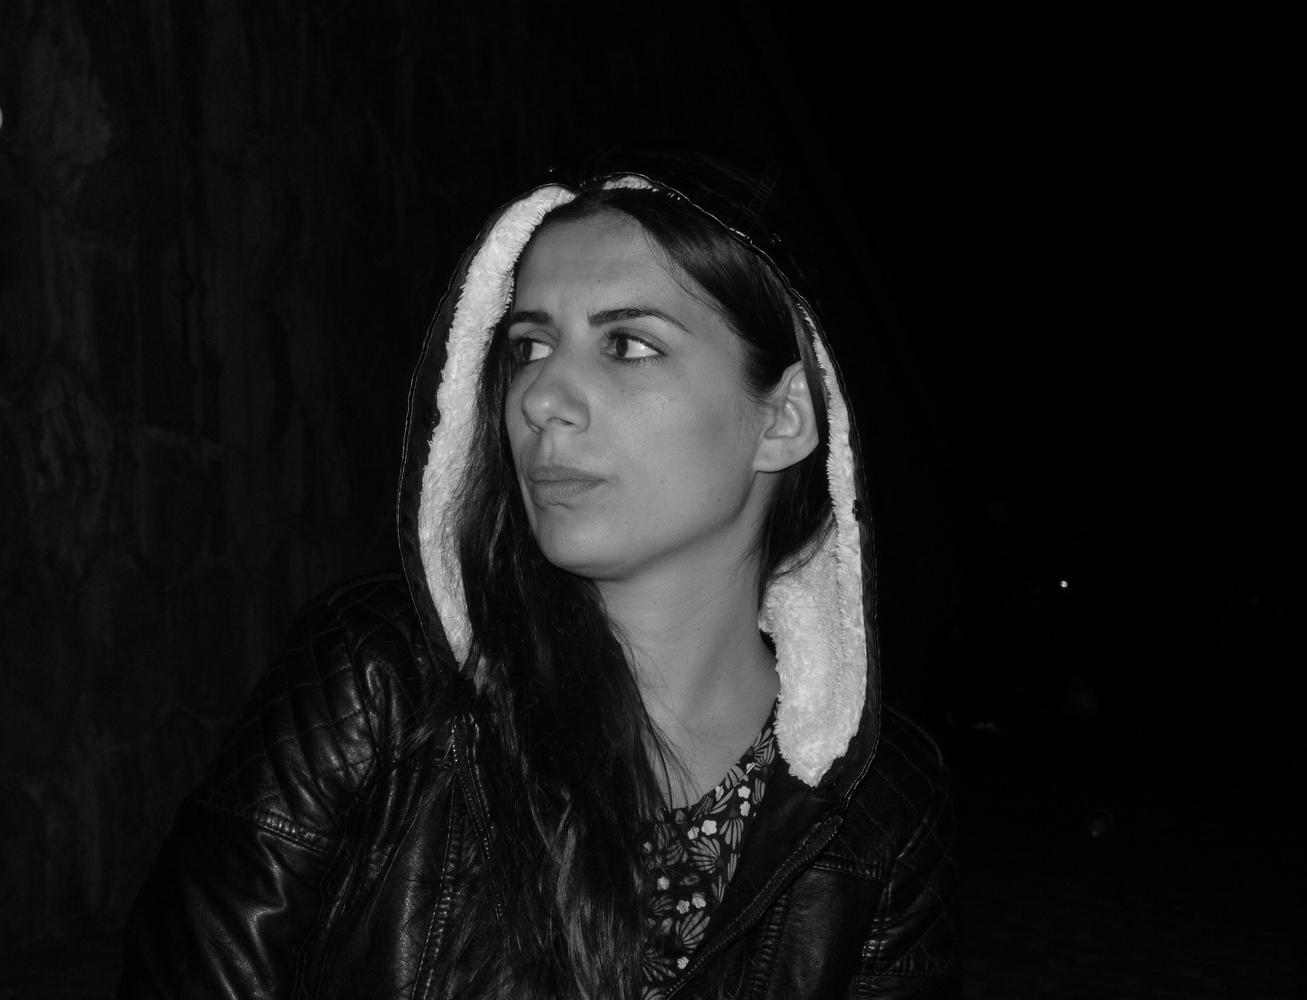 Night portrait  by Blaga Dimitrova